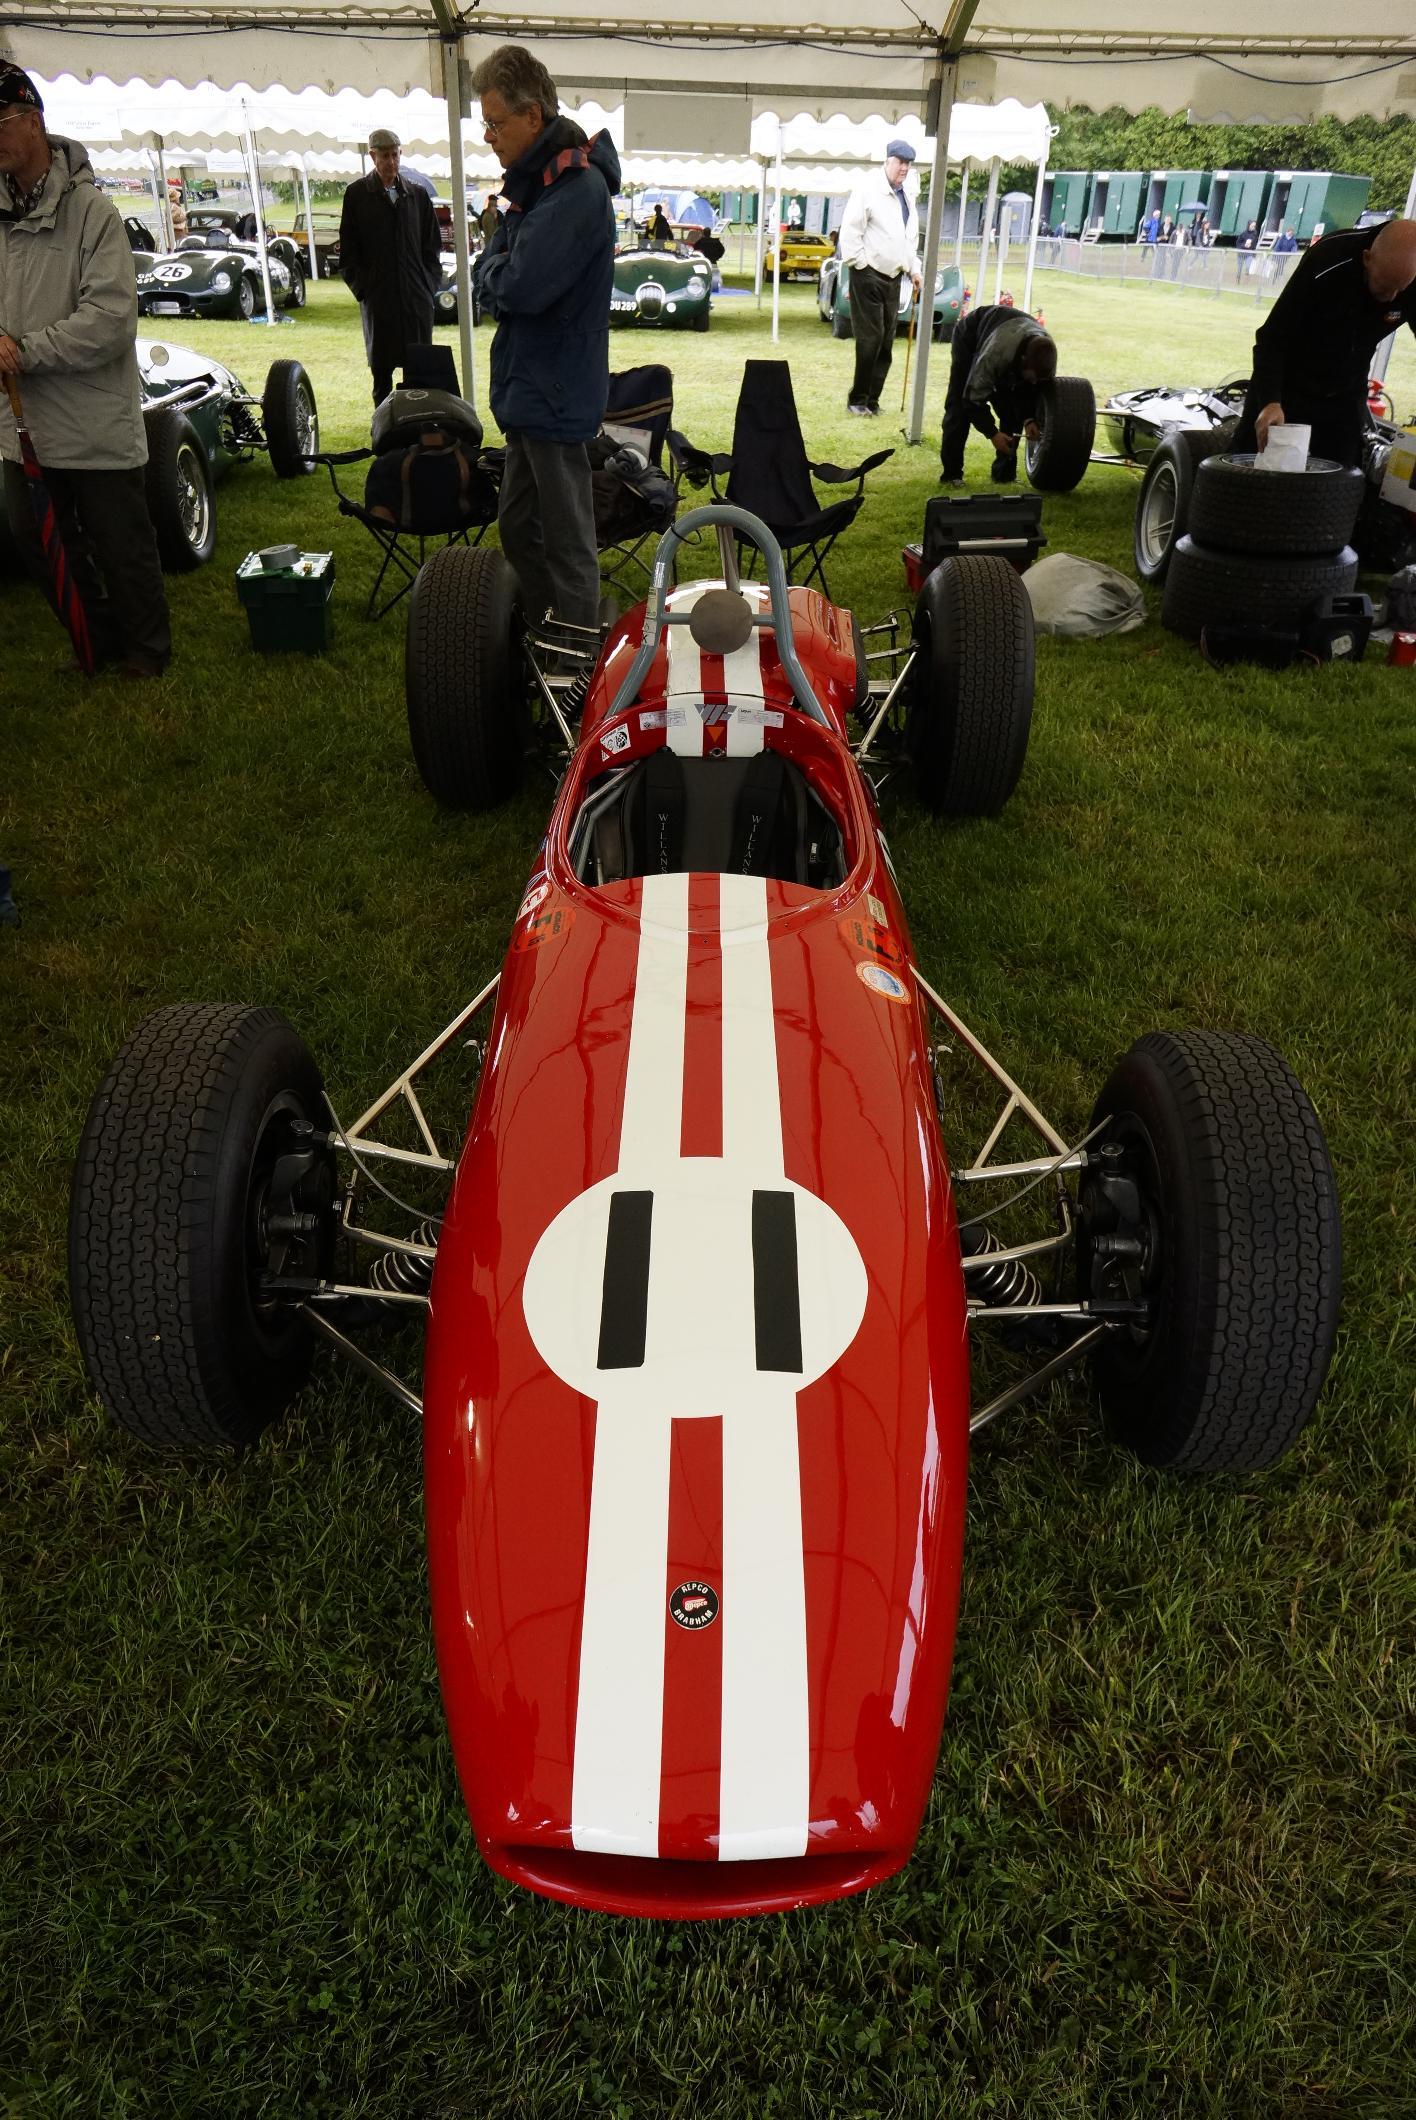 Brabham Repco Cholmondeley 2012